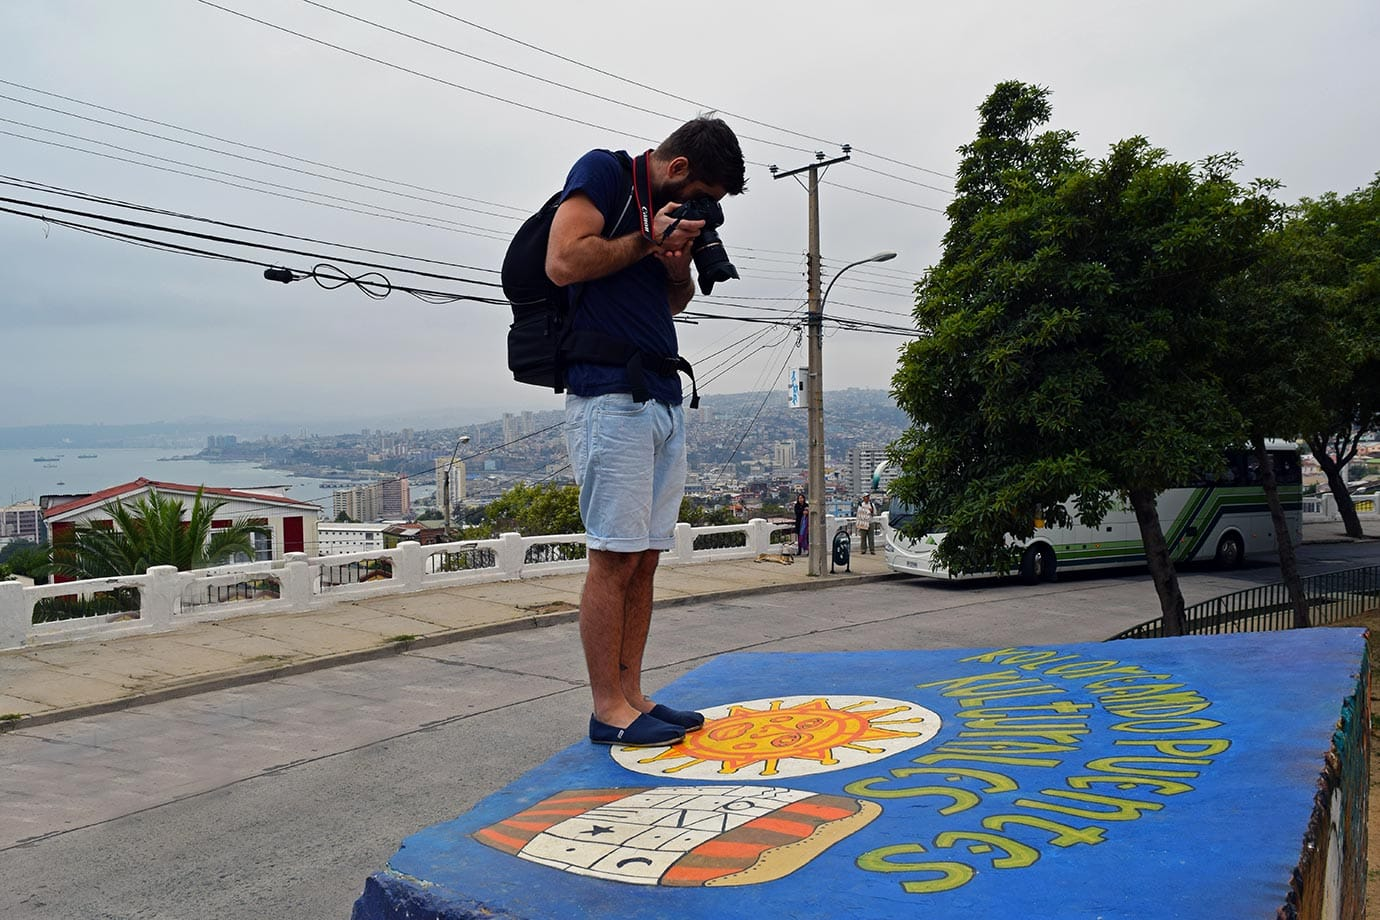 Macca Sherifi, Valparaiso